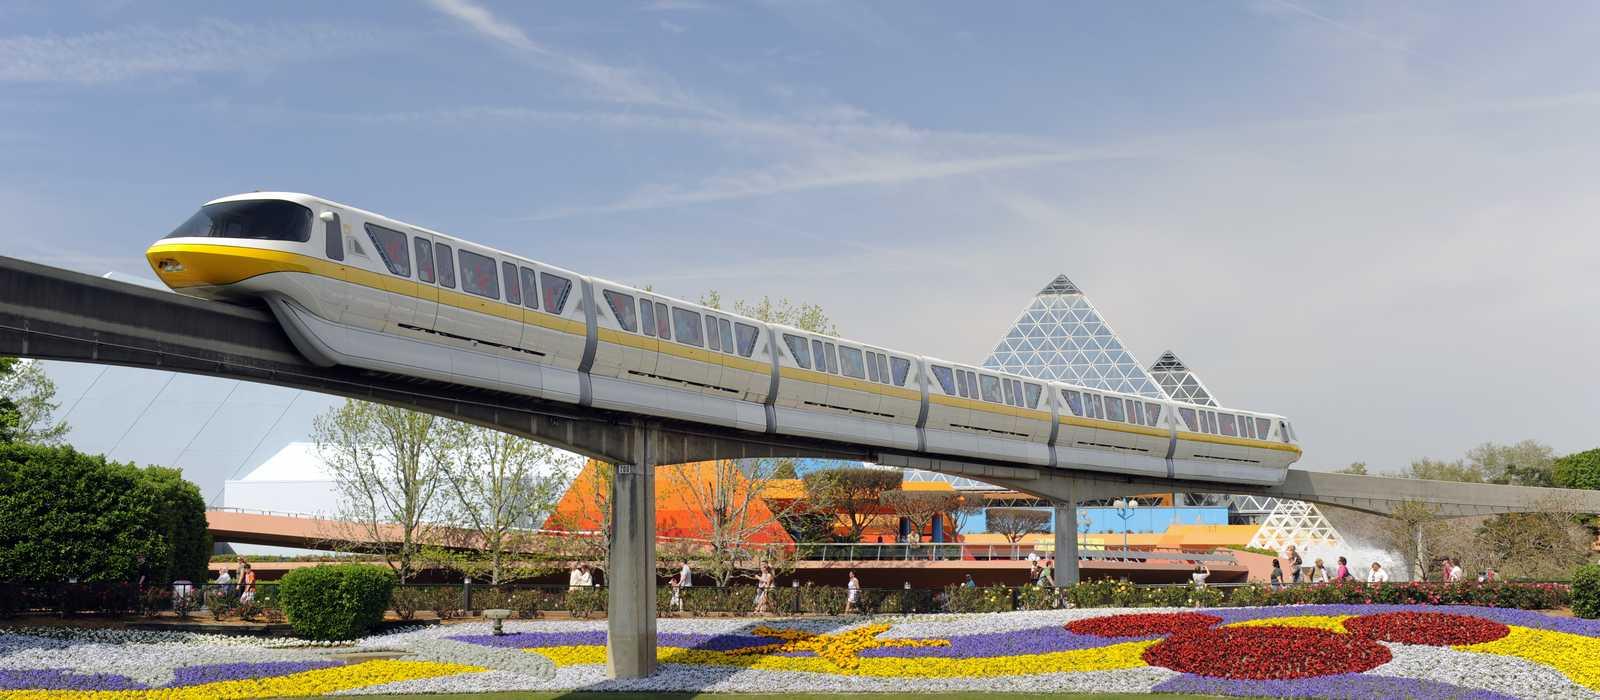 Monorail, Epcot Center, Orlando